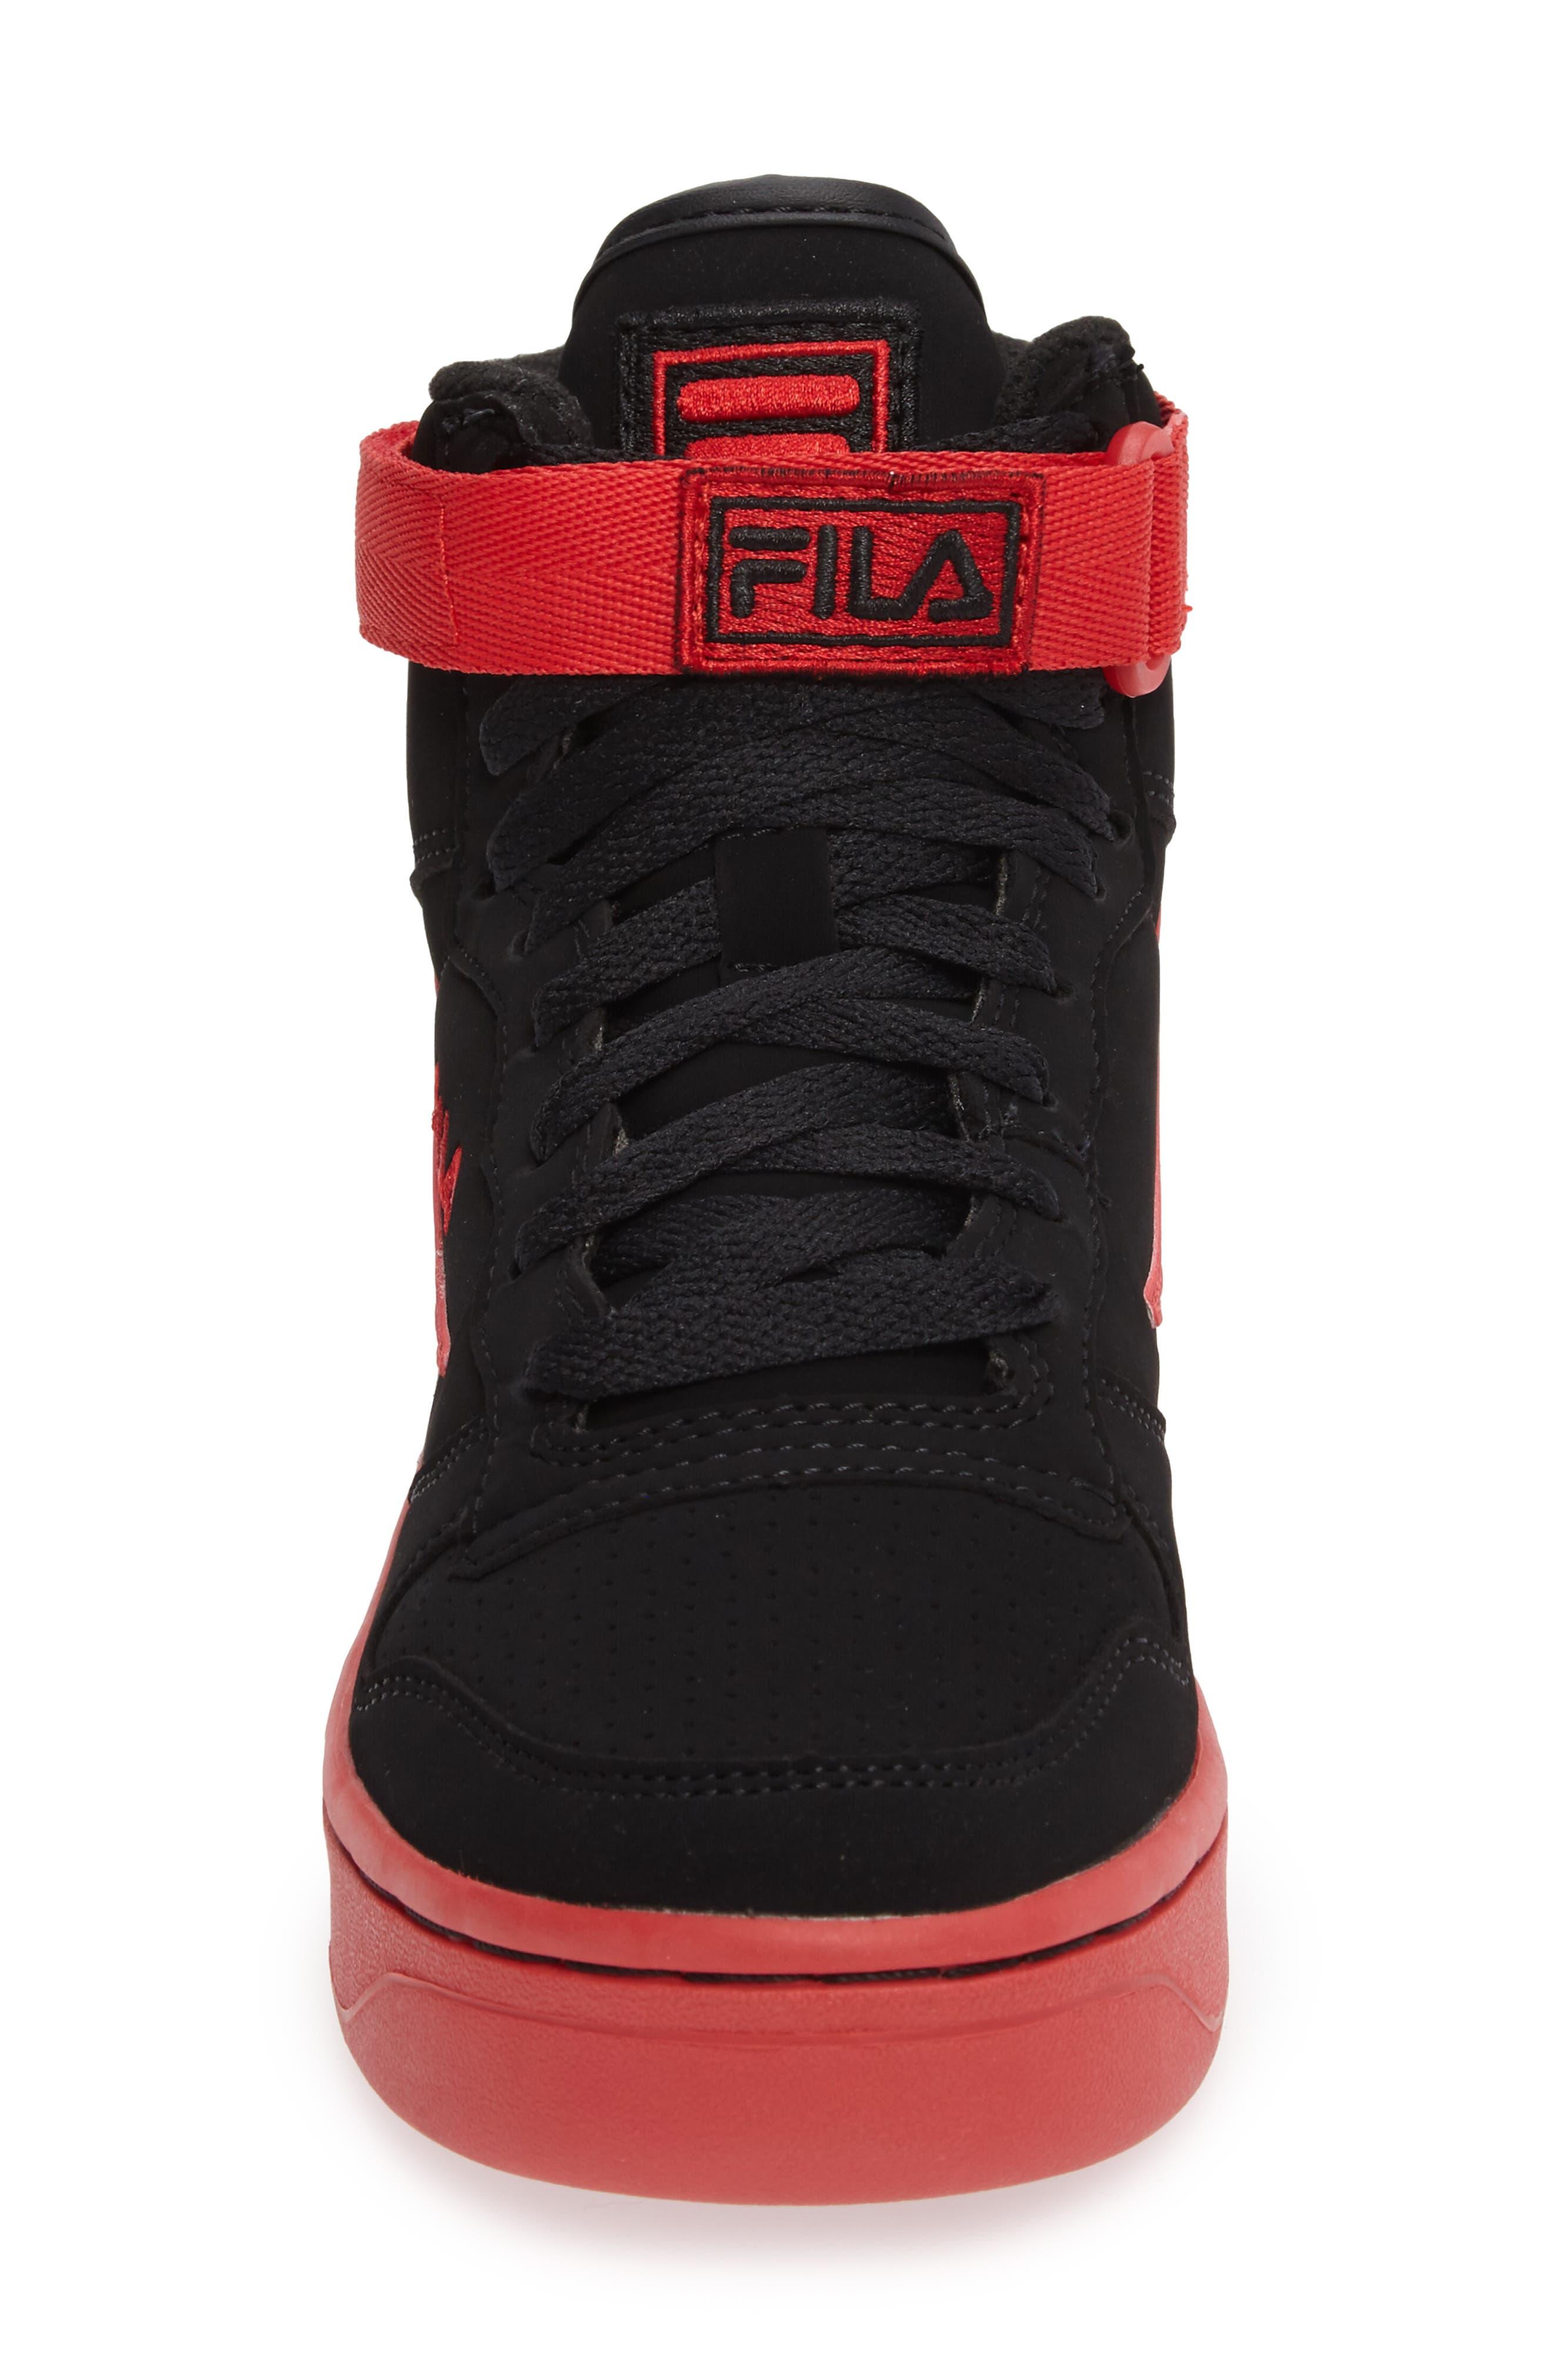 USA FX-100 High Top Sneaker,                             Alternate thumbnail 4, color,                             001